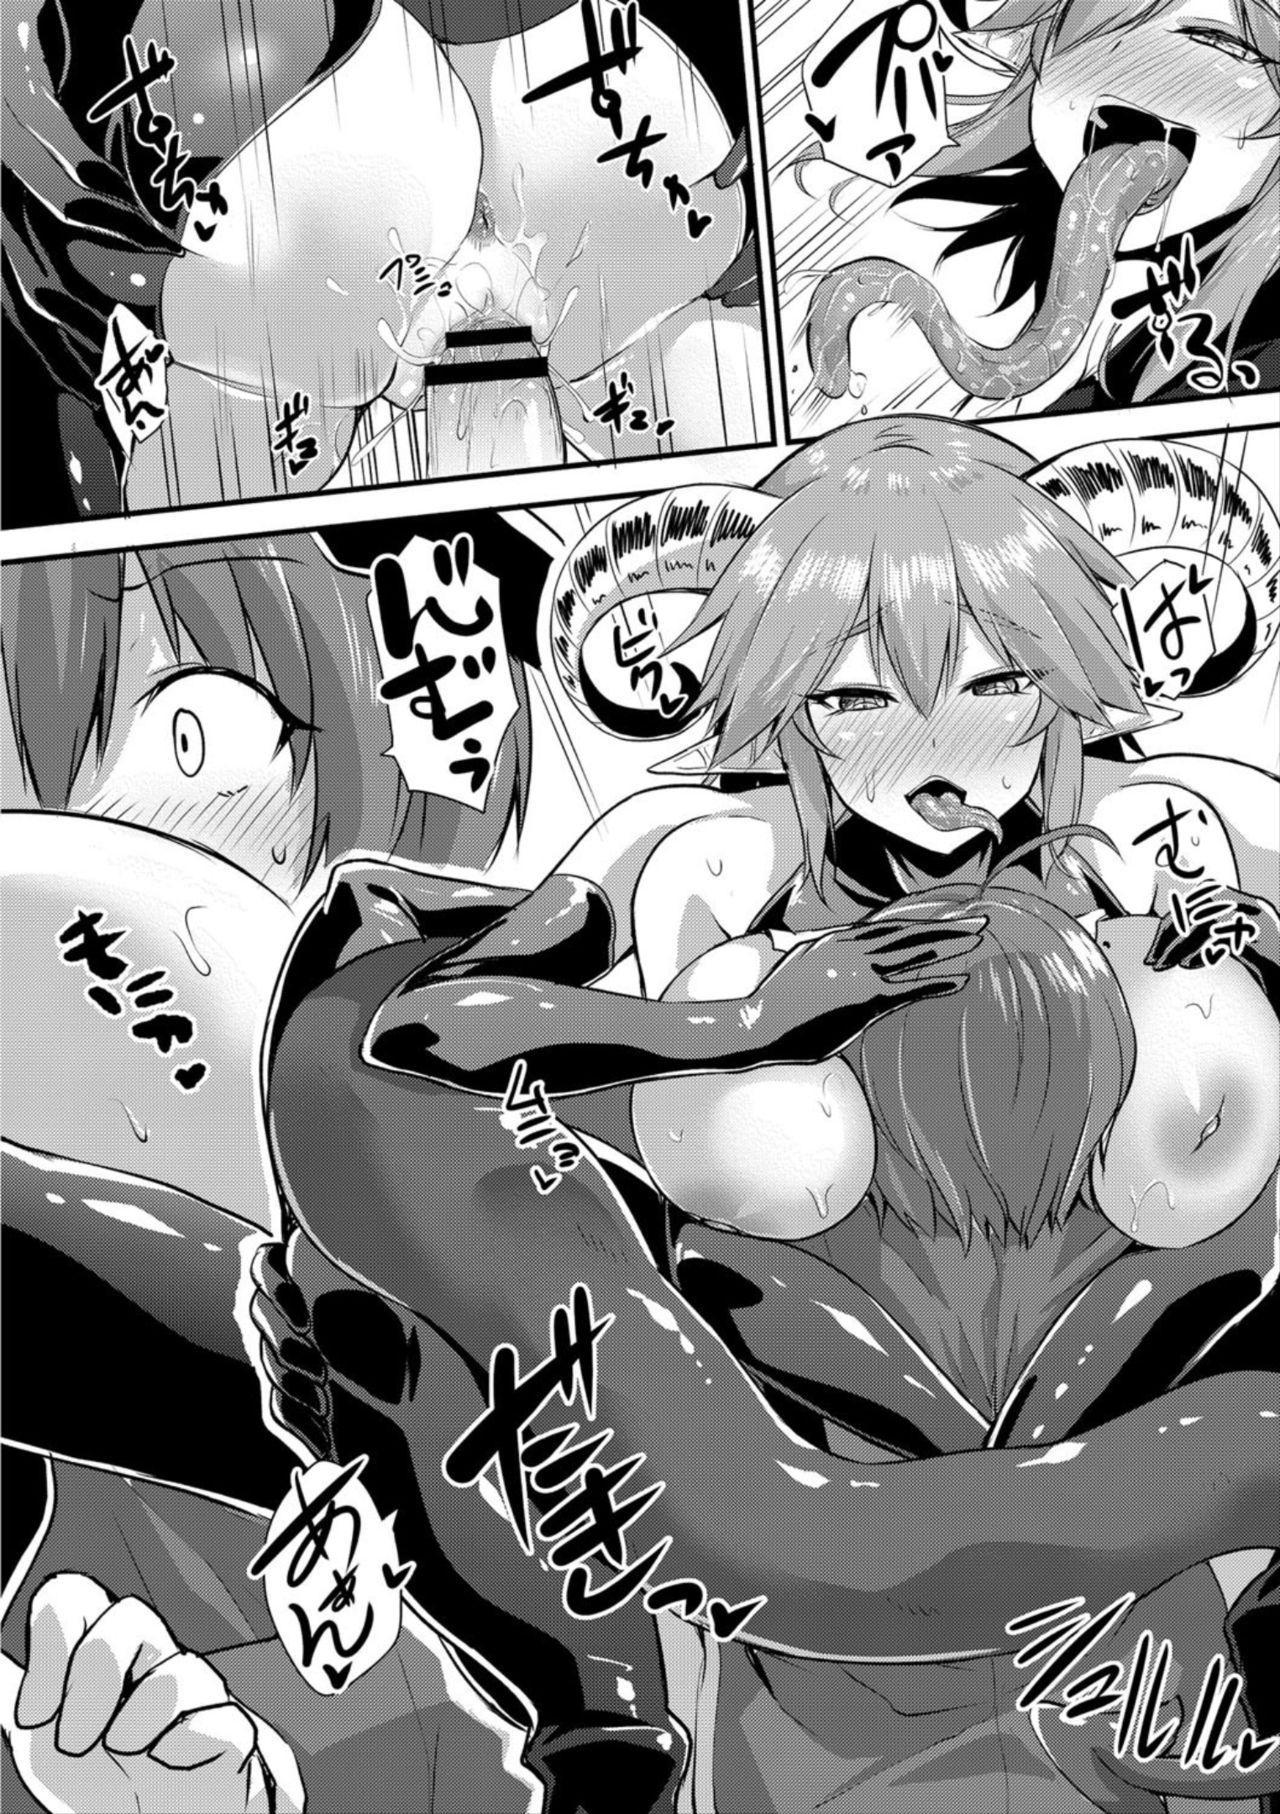 Echidna-sama no Himatsubushi 2 Ch. 1 23